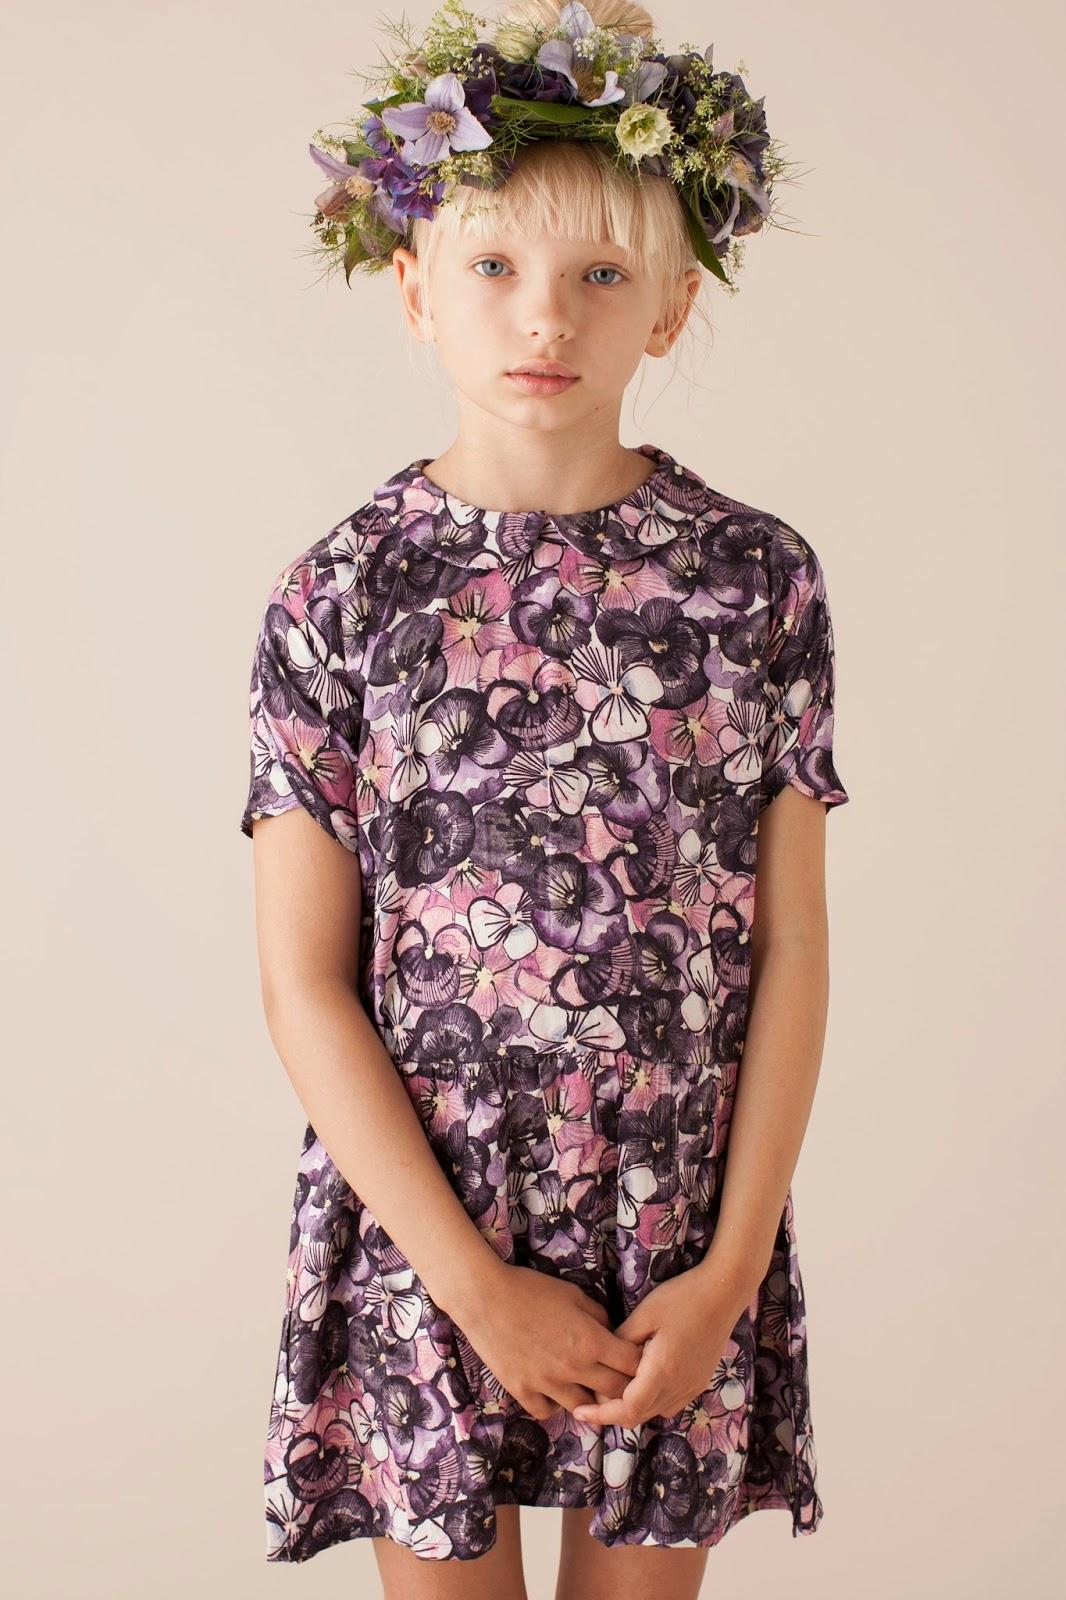 Soft Gallery moda niña Primavera Verano 2014